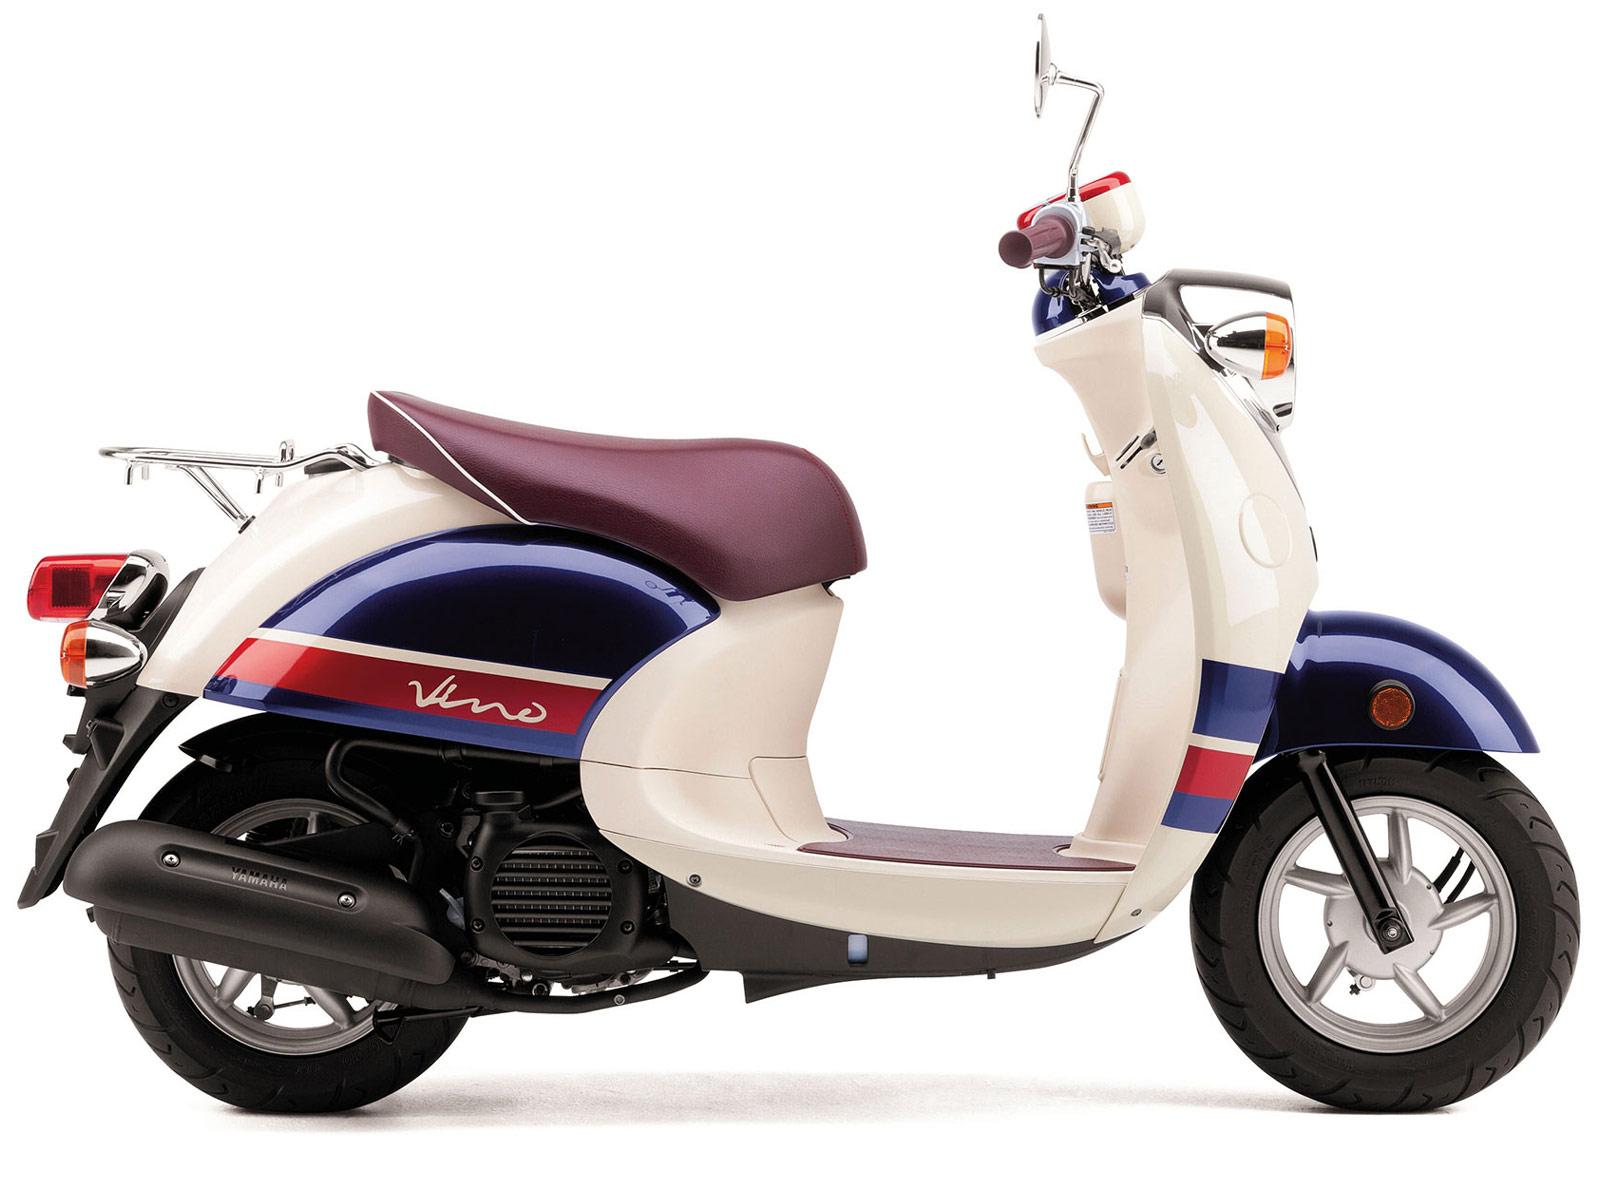 Yamaha Insurance information Vino Classic 2014 specifications